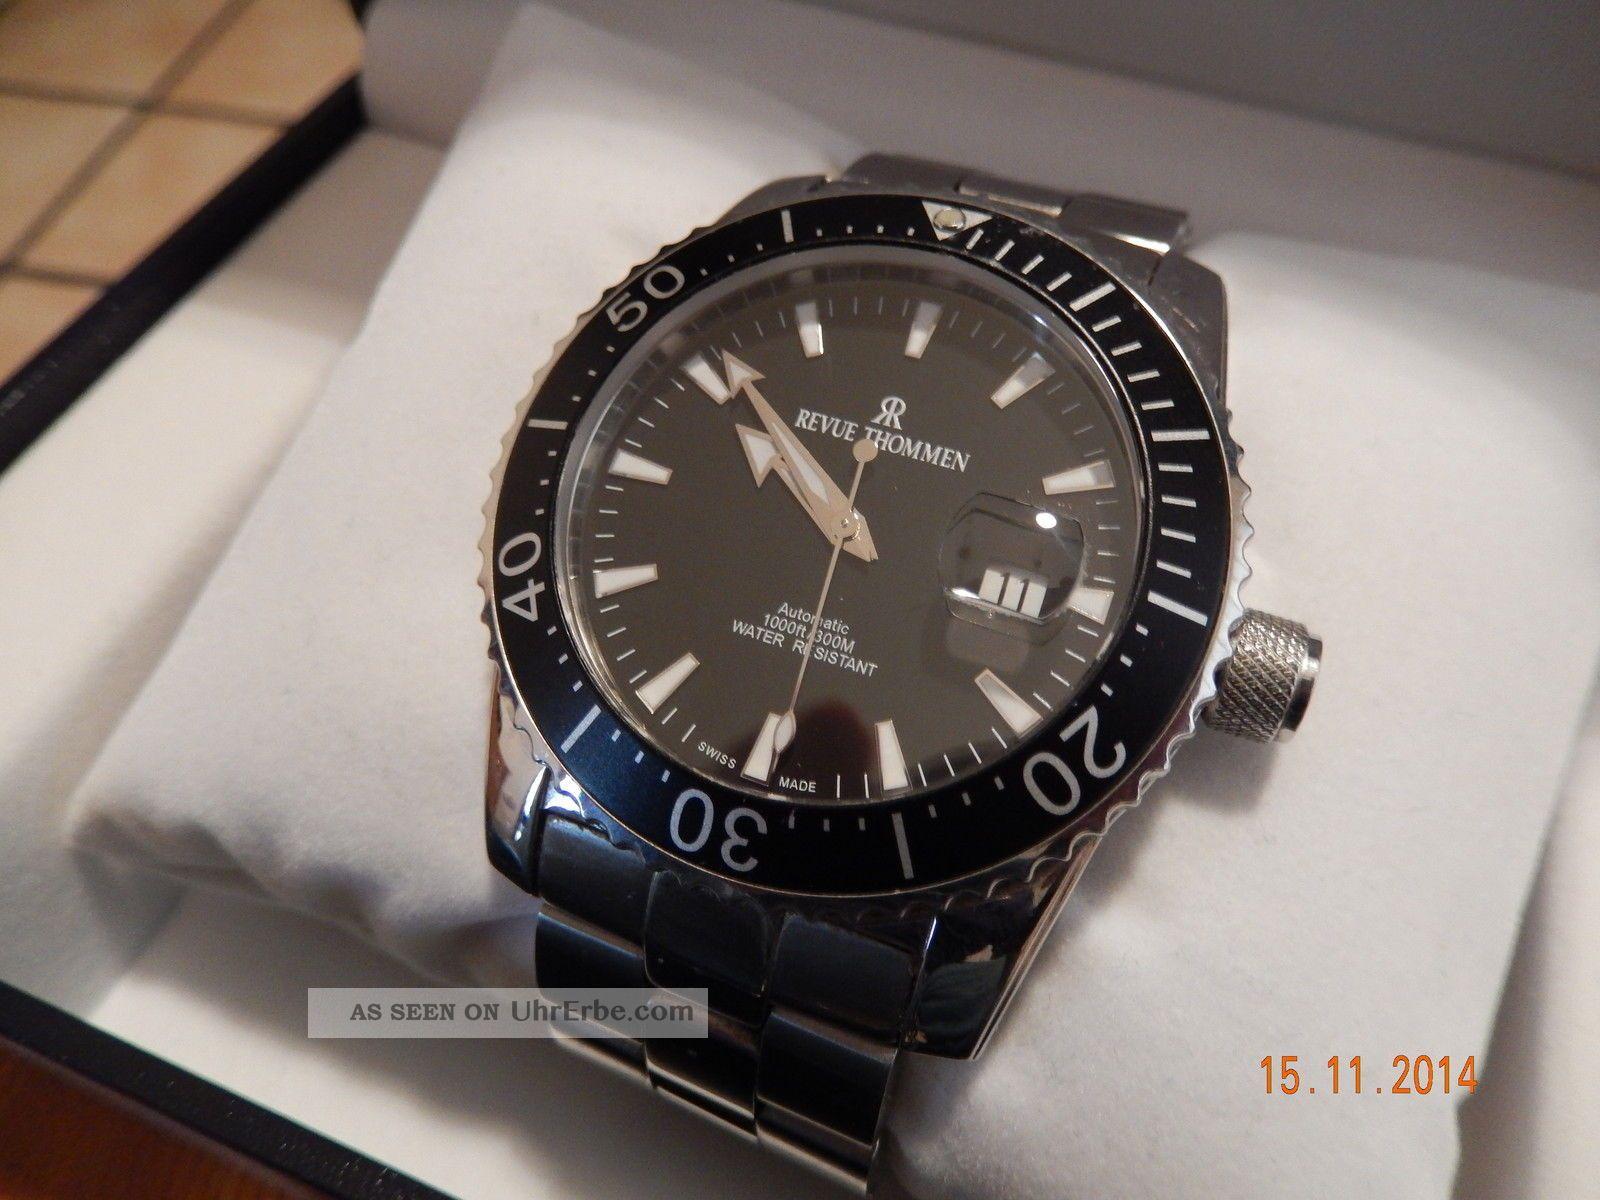 Revue Thommen Eta2824 - Professional - Diver Uhr 17030.  2137 Swiss Made Armbanduhren Bild